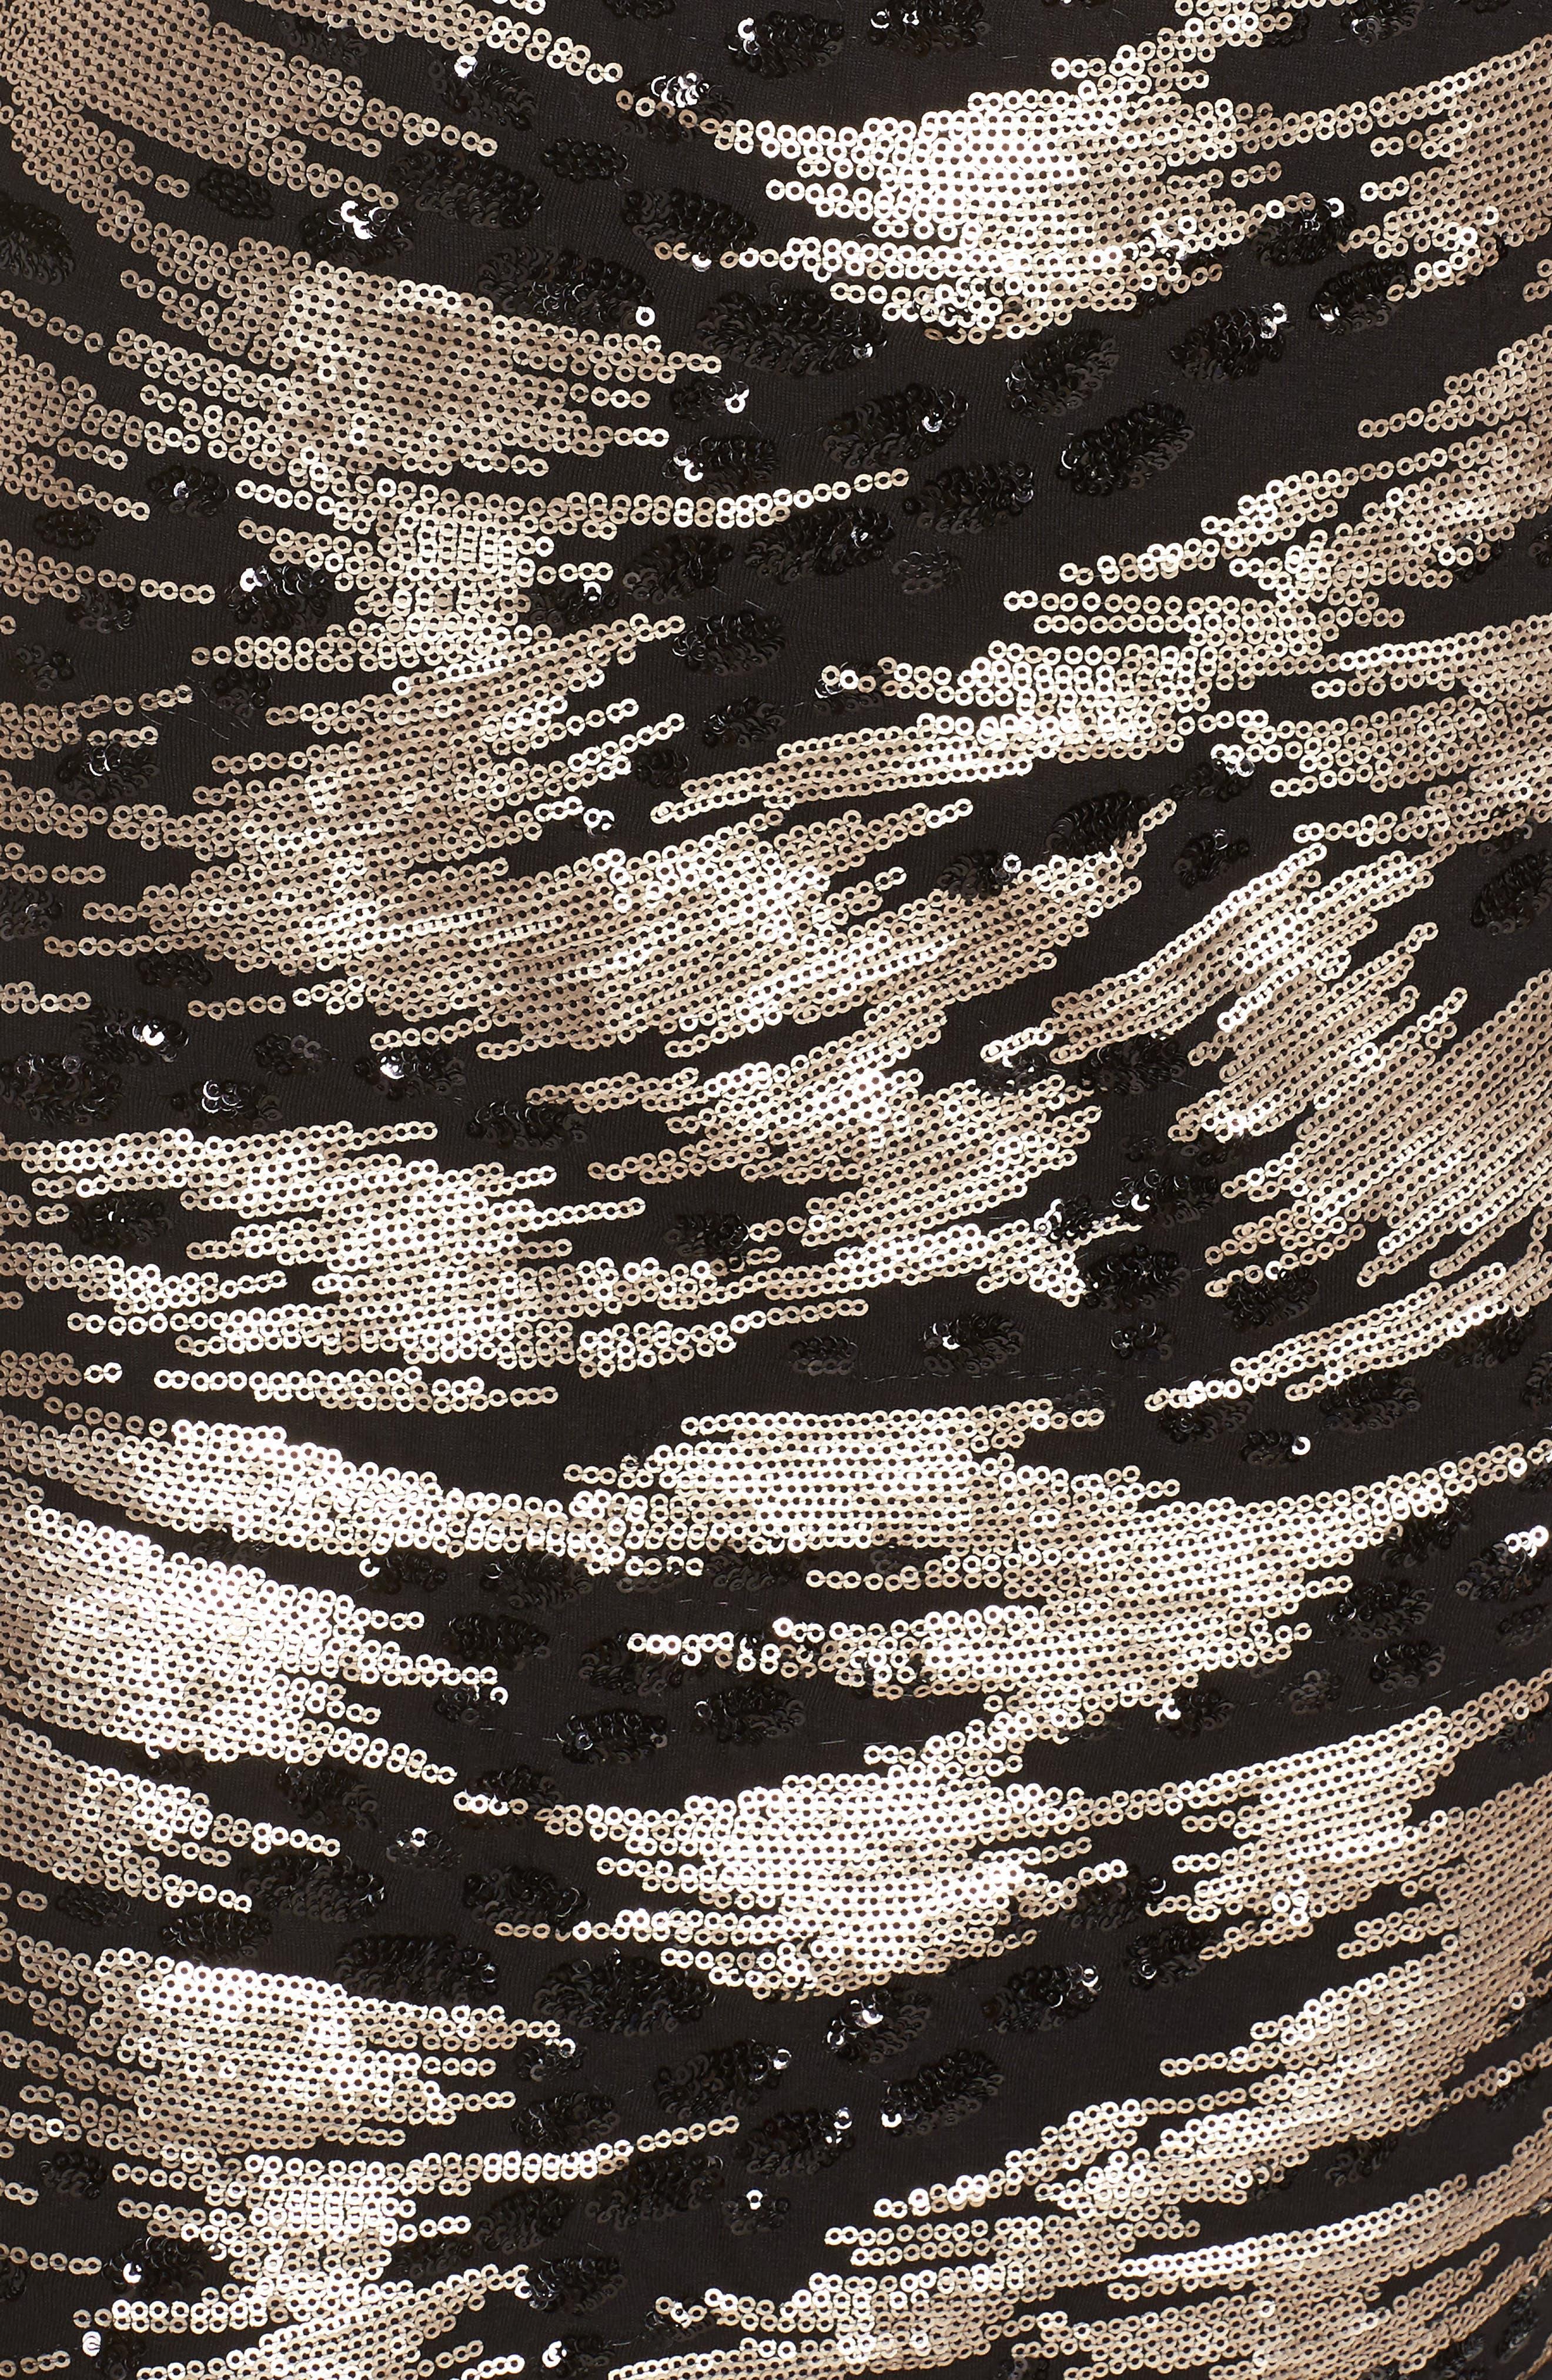 Sequin Sheath Dress,                             Alternate thumbnail 6, color,                             BLACK/ GOLD